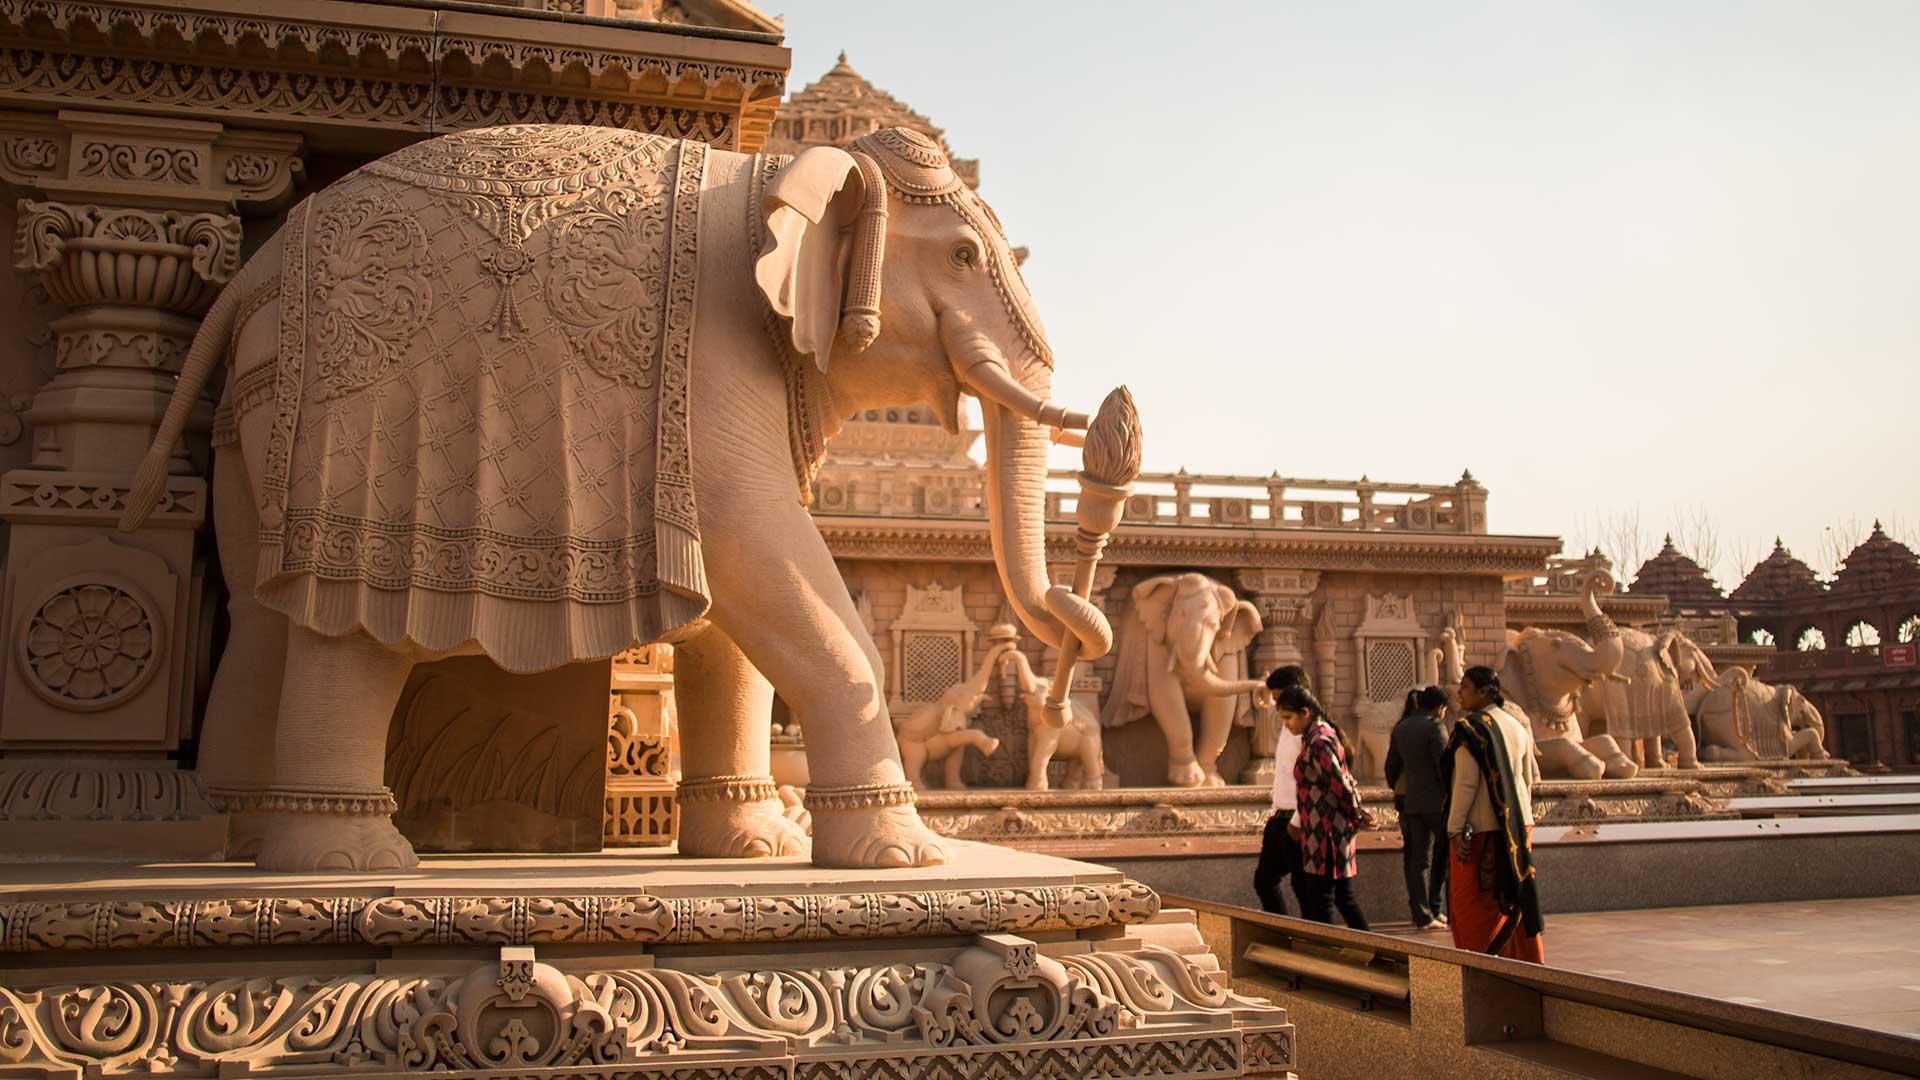 Gajendra Peeth Pictures Ndash Swaminarayan Akshardham New Delhi